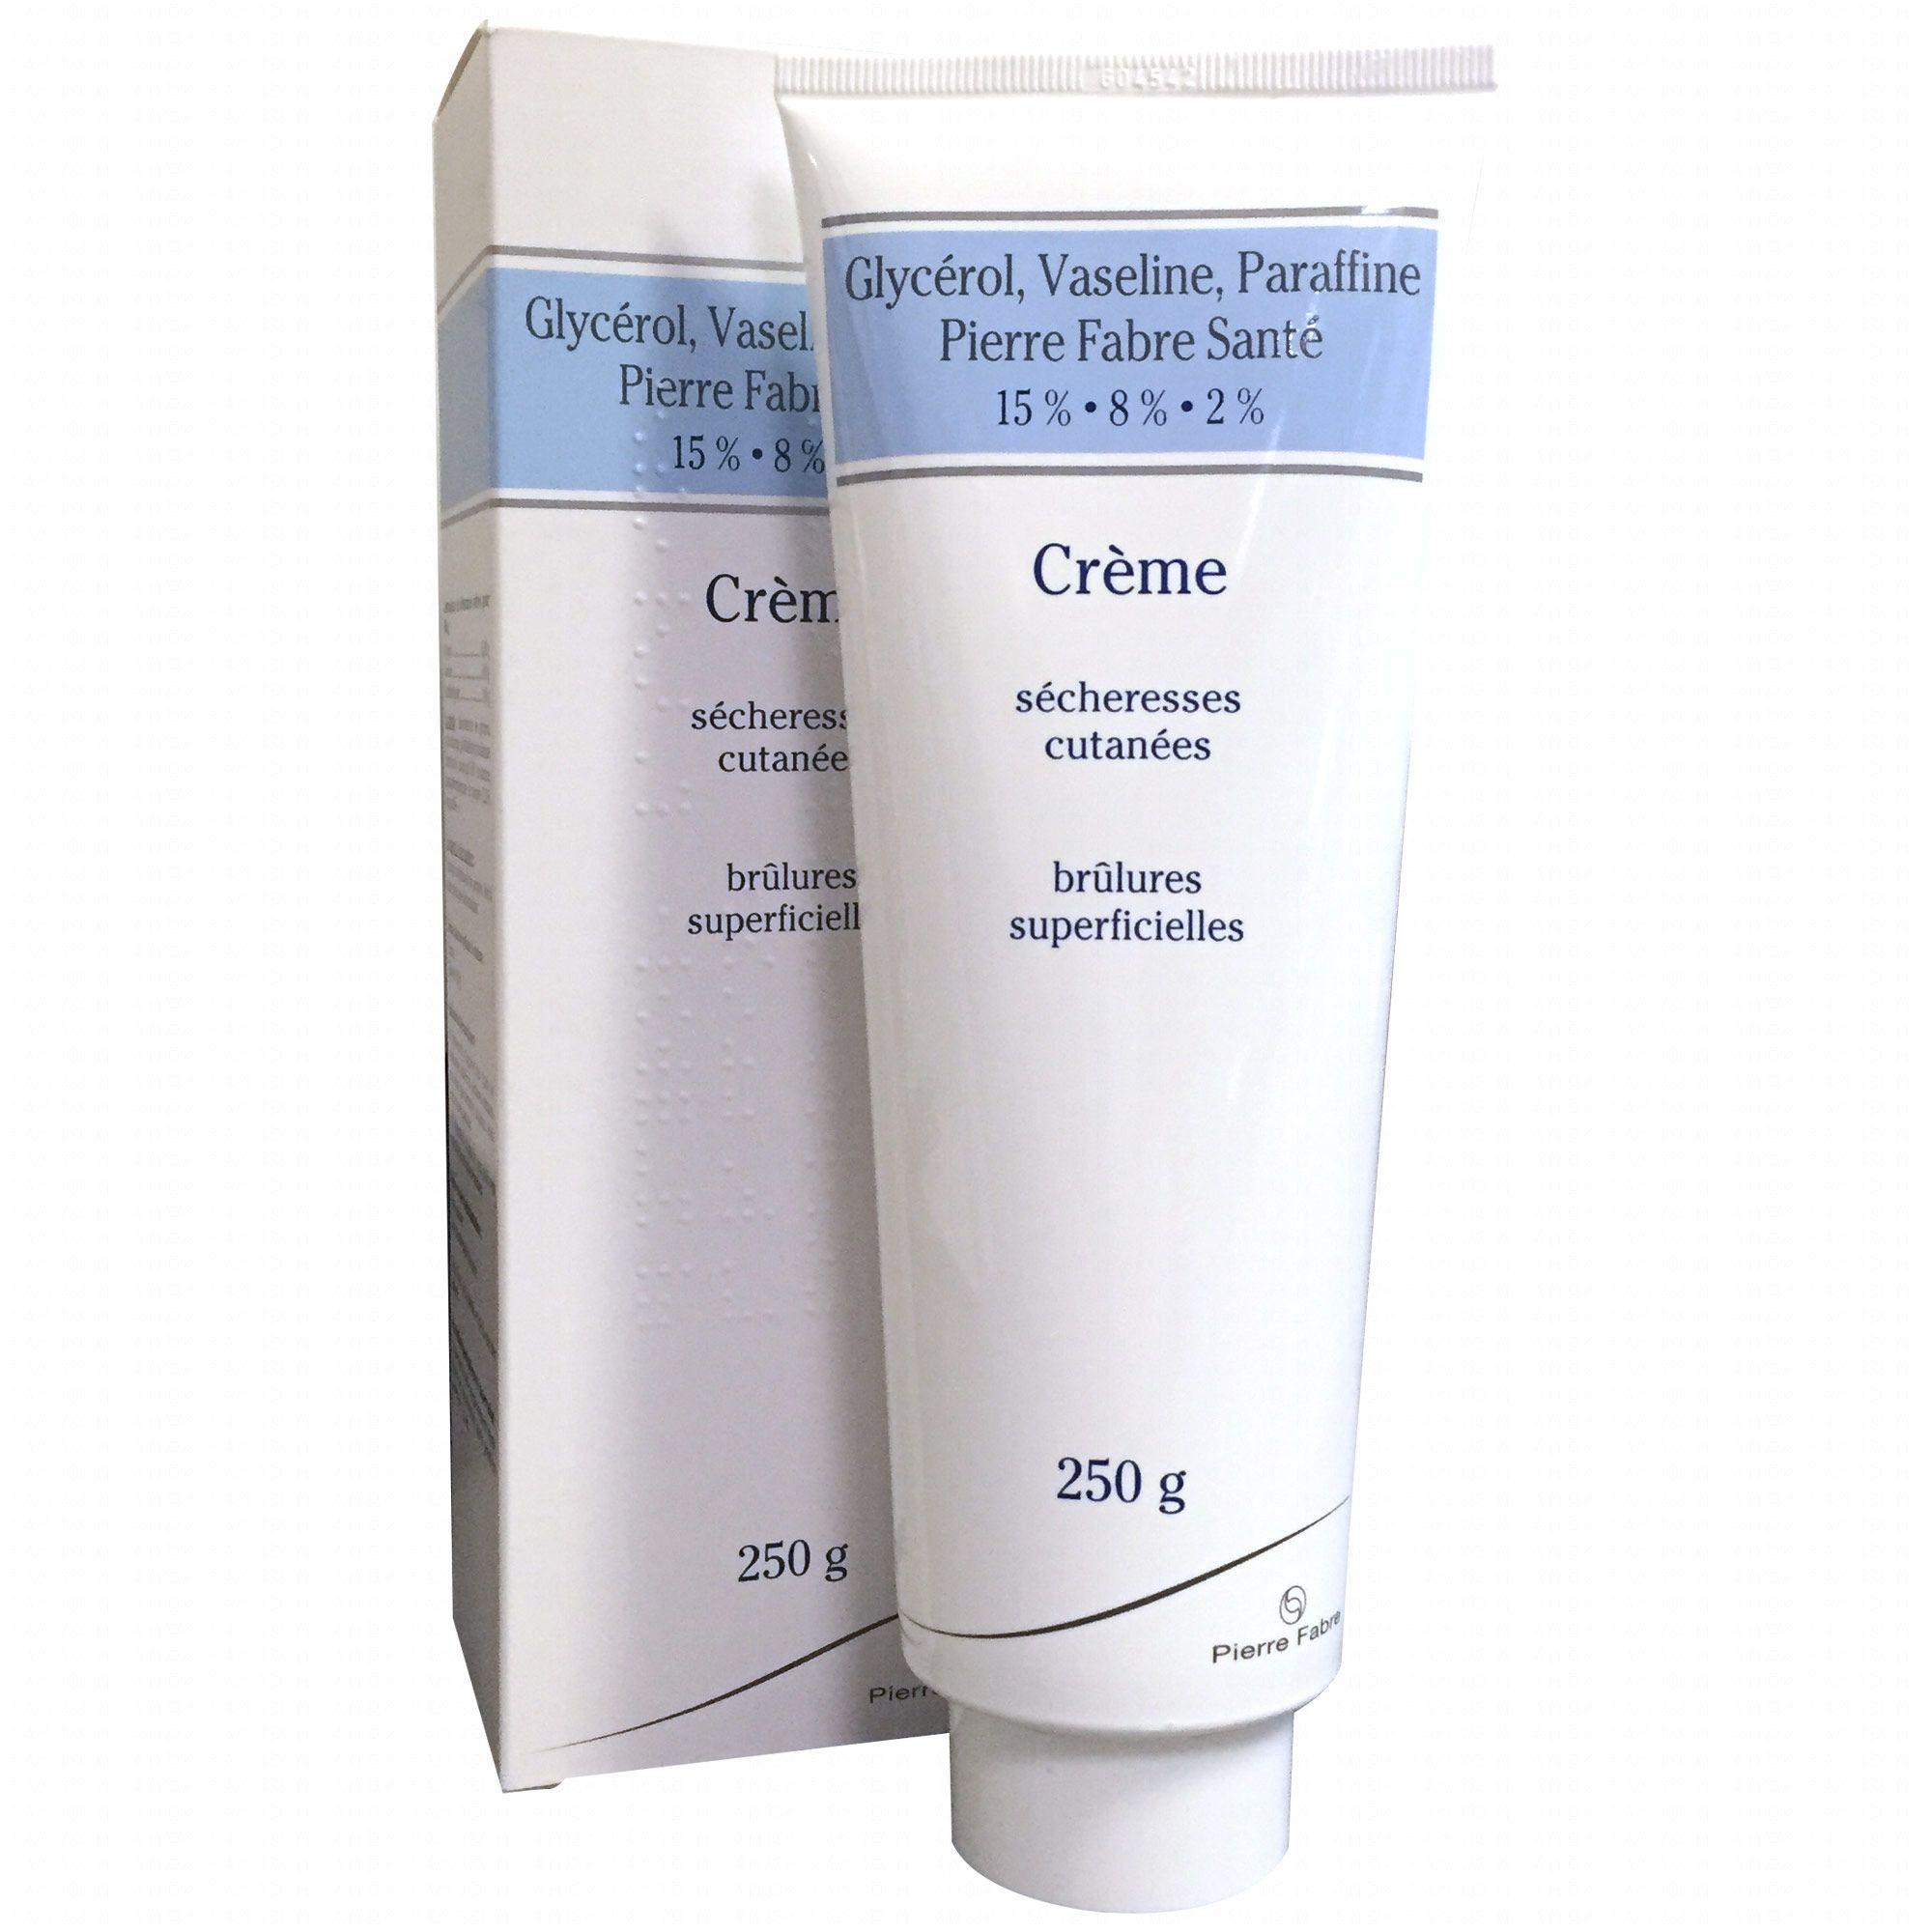 Pierre Fabre Glycerol Vaseline Paraffine 15% 8% 2%